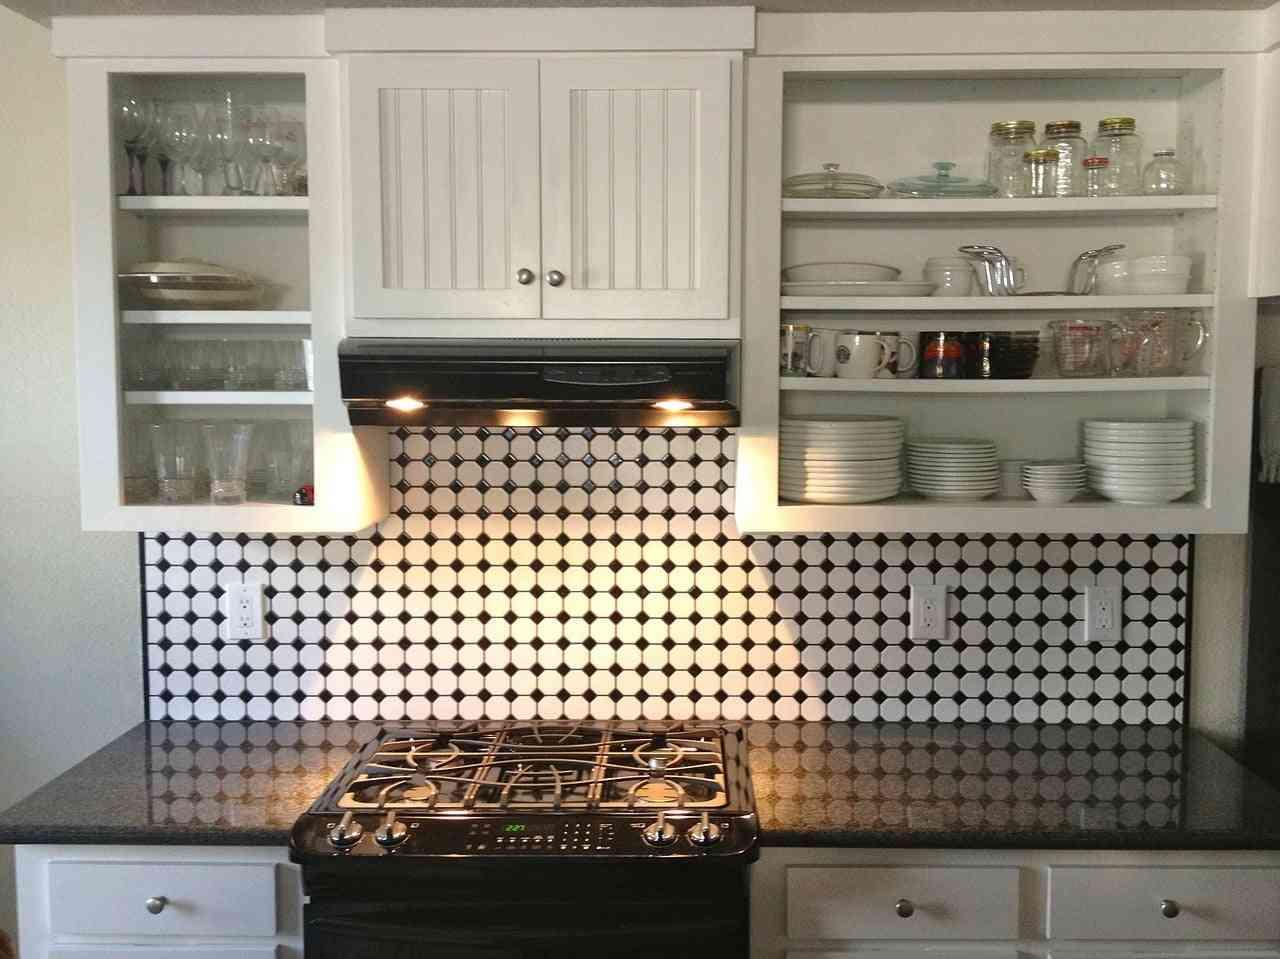 hornos para la cocina